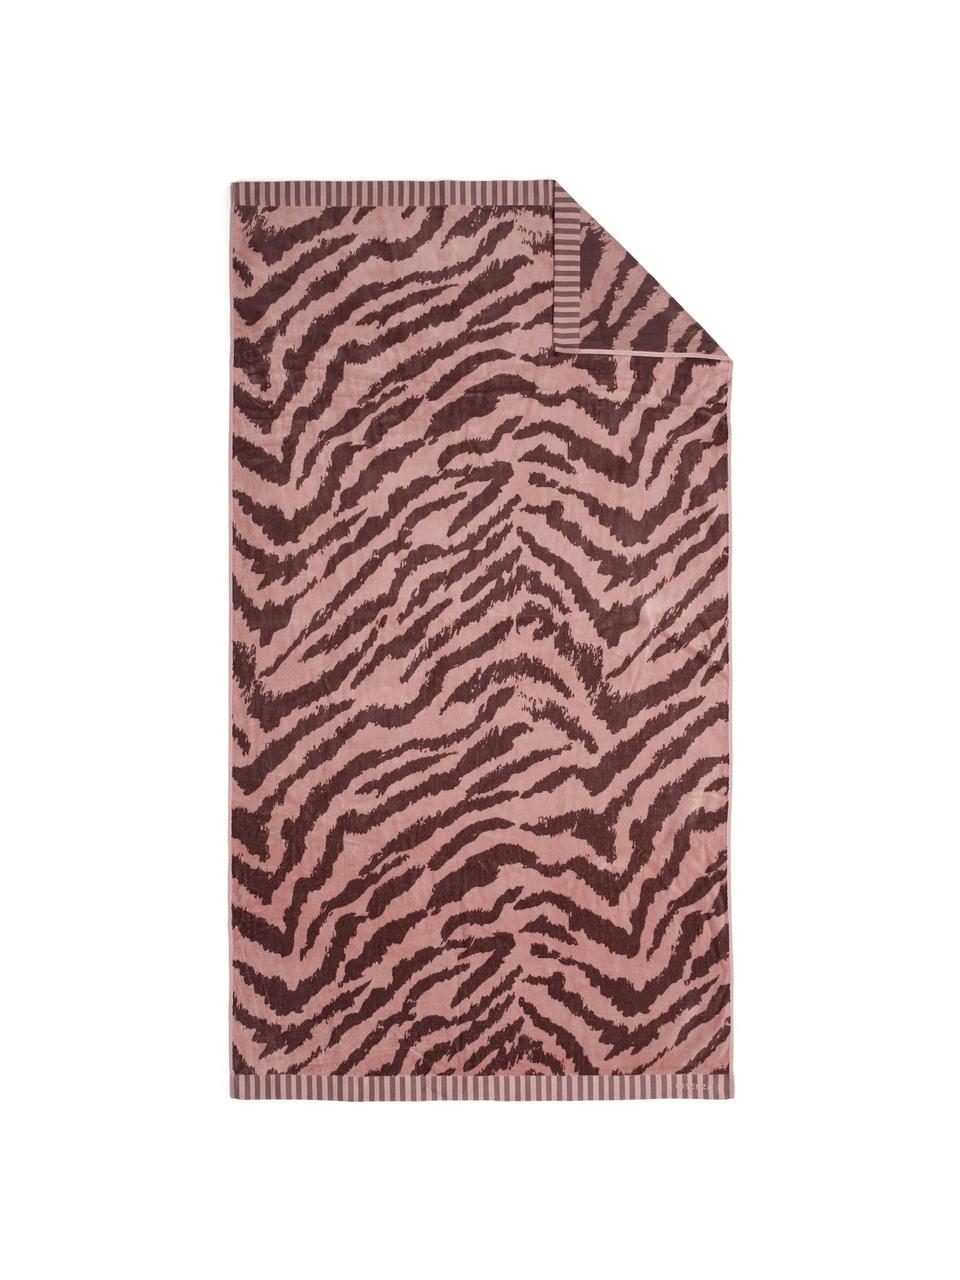 Strandlaken Belen met zebrapatroon in rood/roze, Roze, donkerrood, 100 x 180 cm